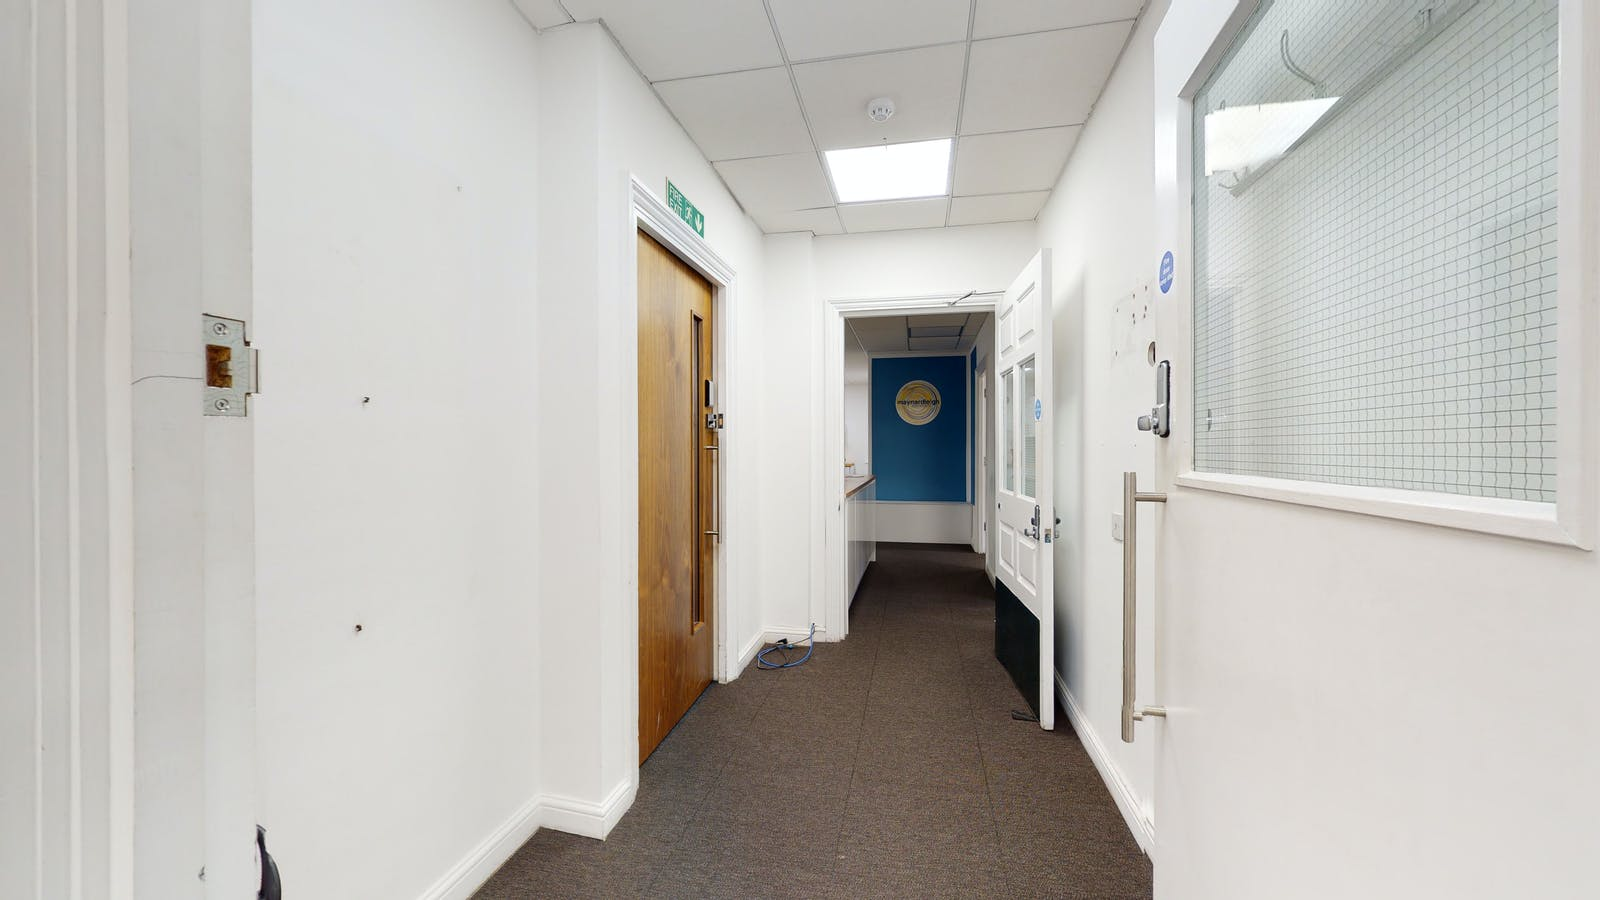 3 Bath Place, 3 Bath Place, London, Office To Let - Space Photo 5.jpg